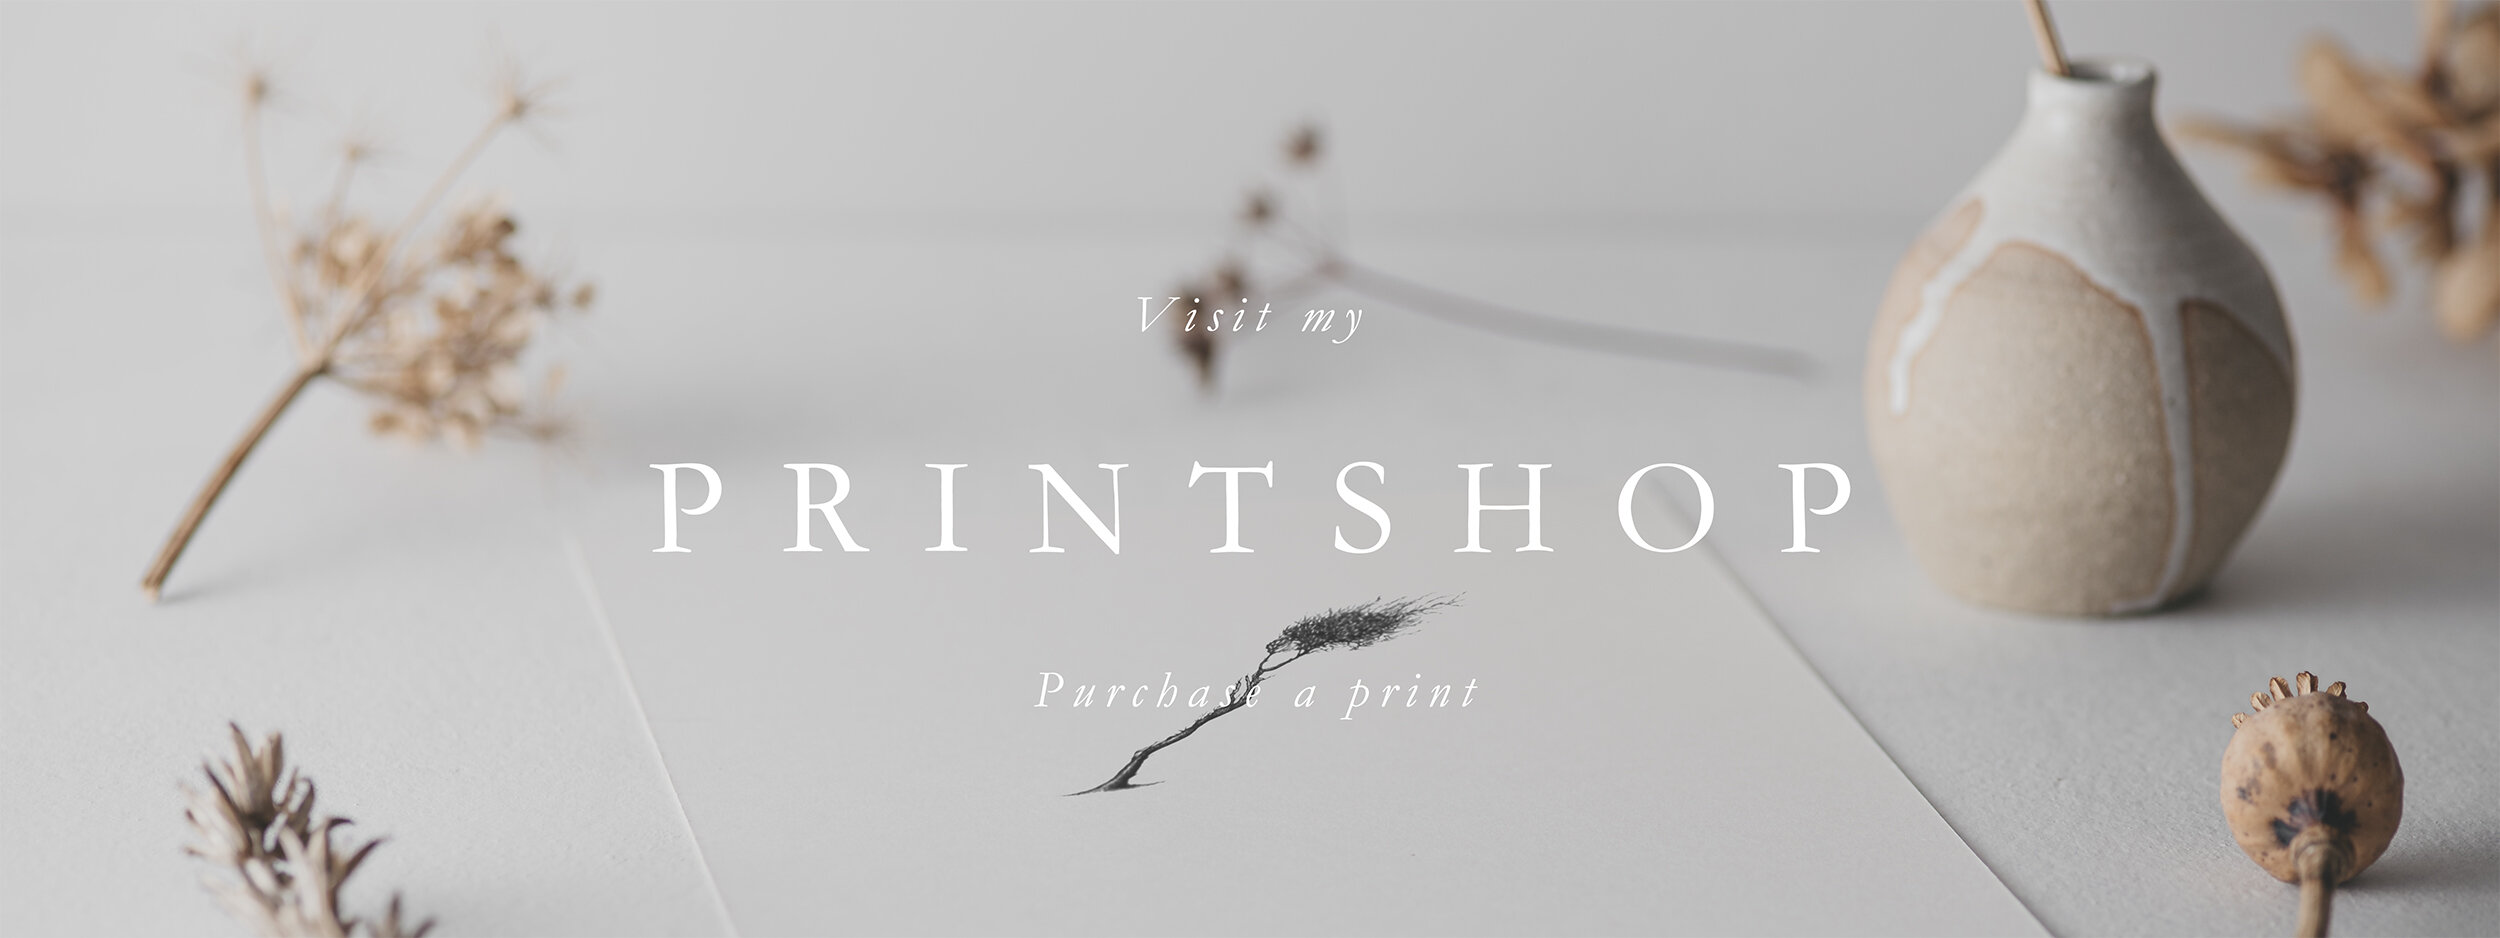 Printshop_Banner.jpg